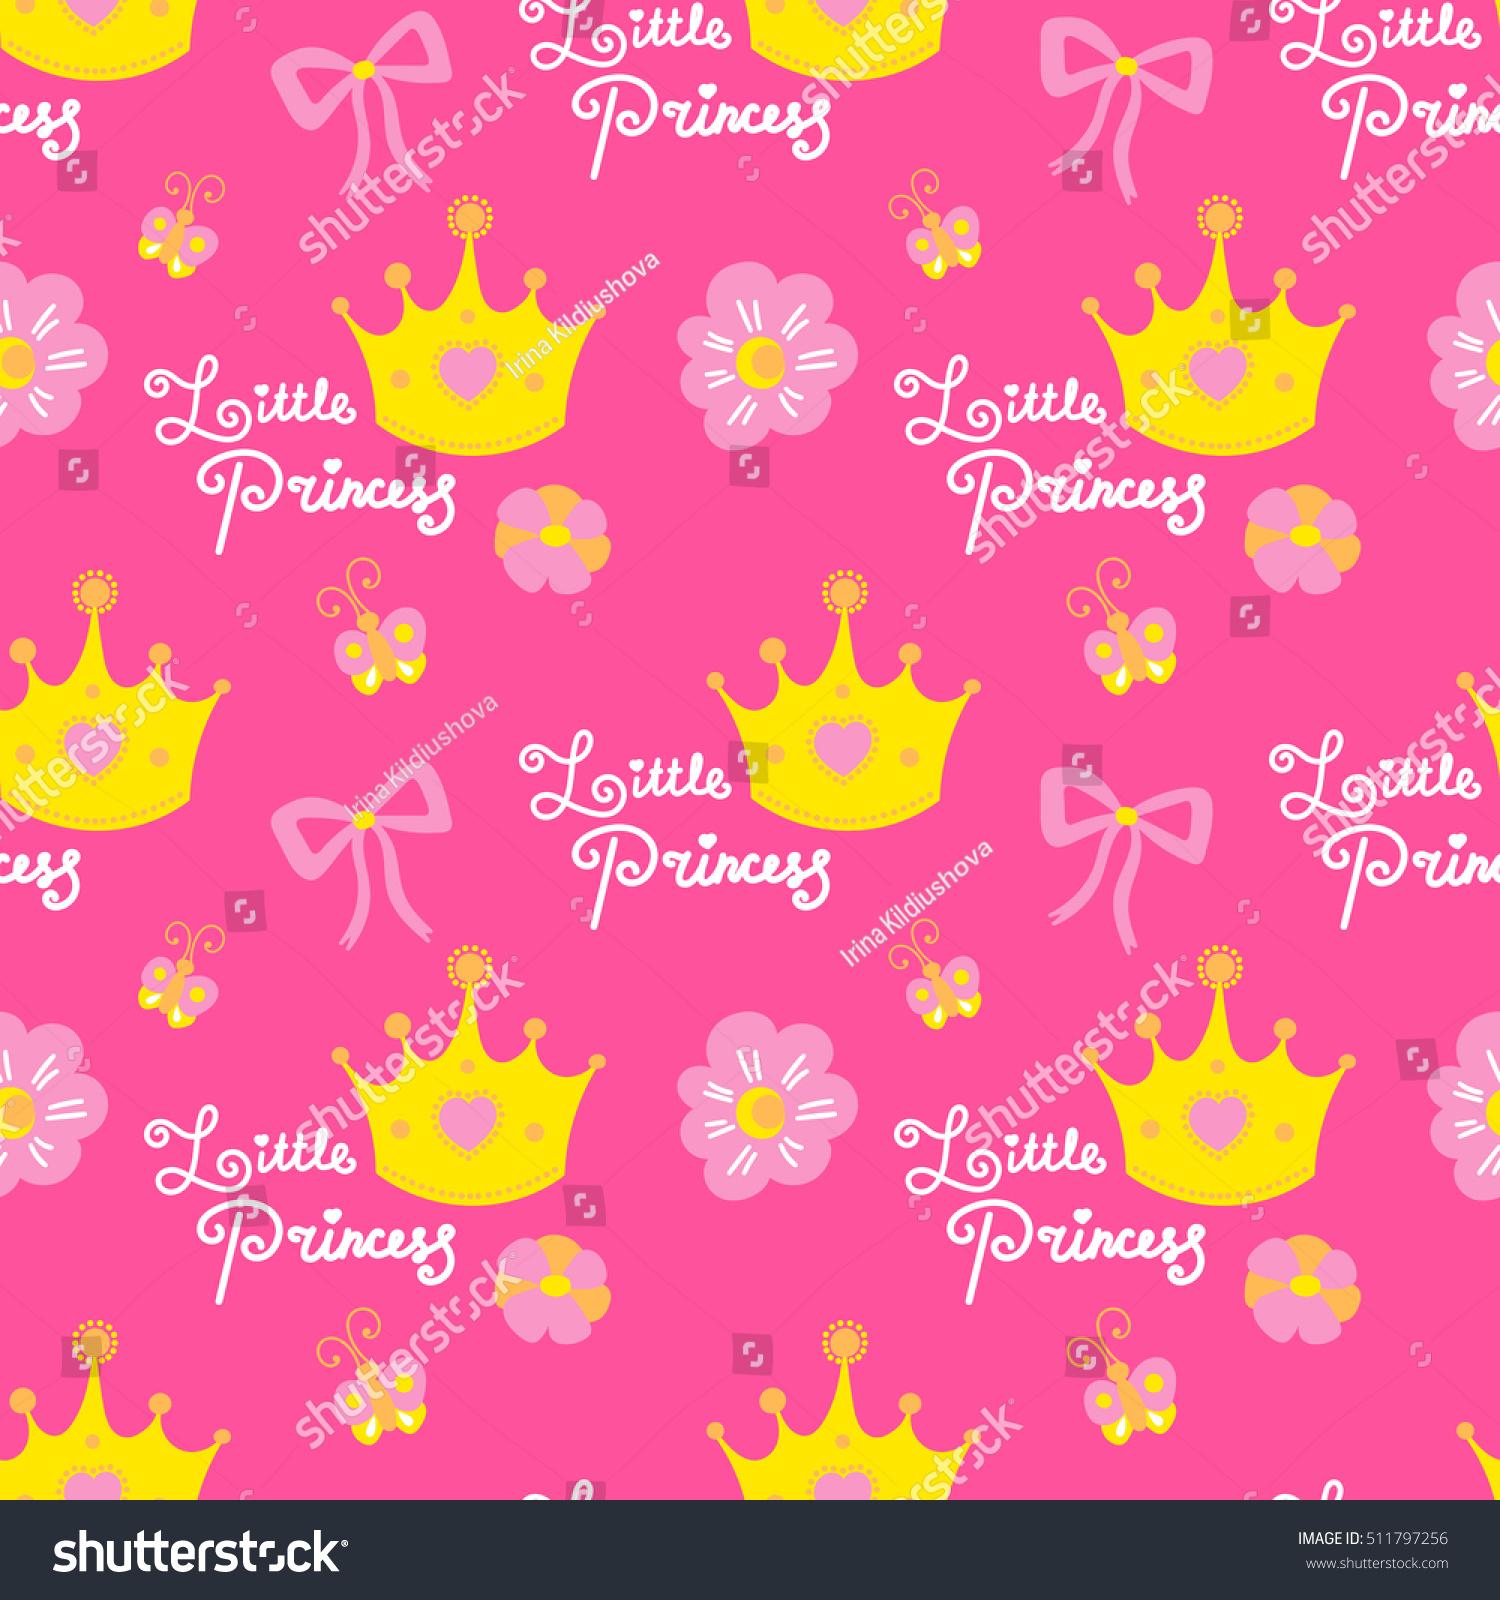 Little Princess Pattern Vector Pink Girl Stock Vector